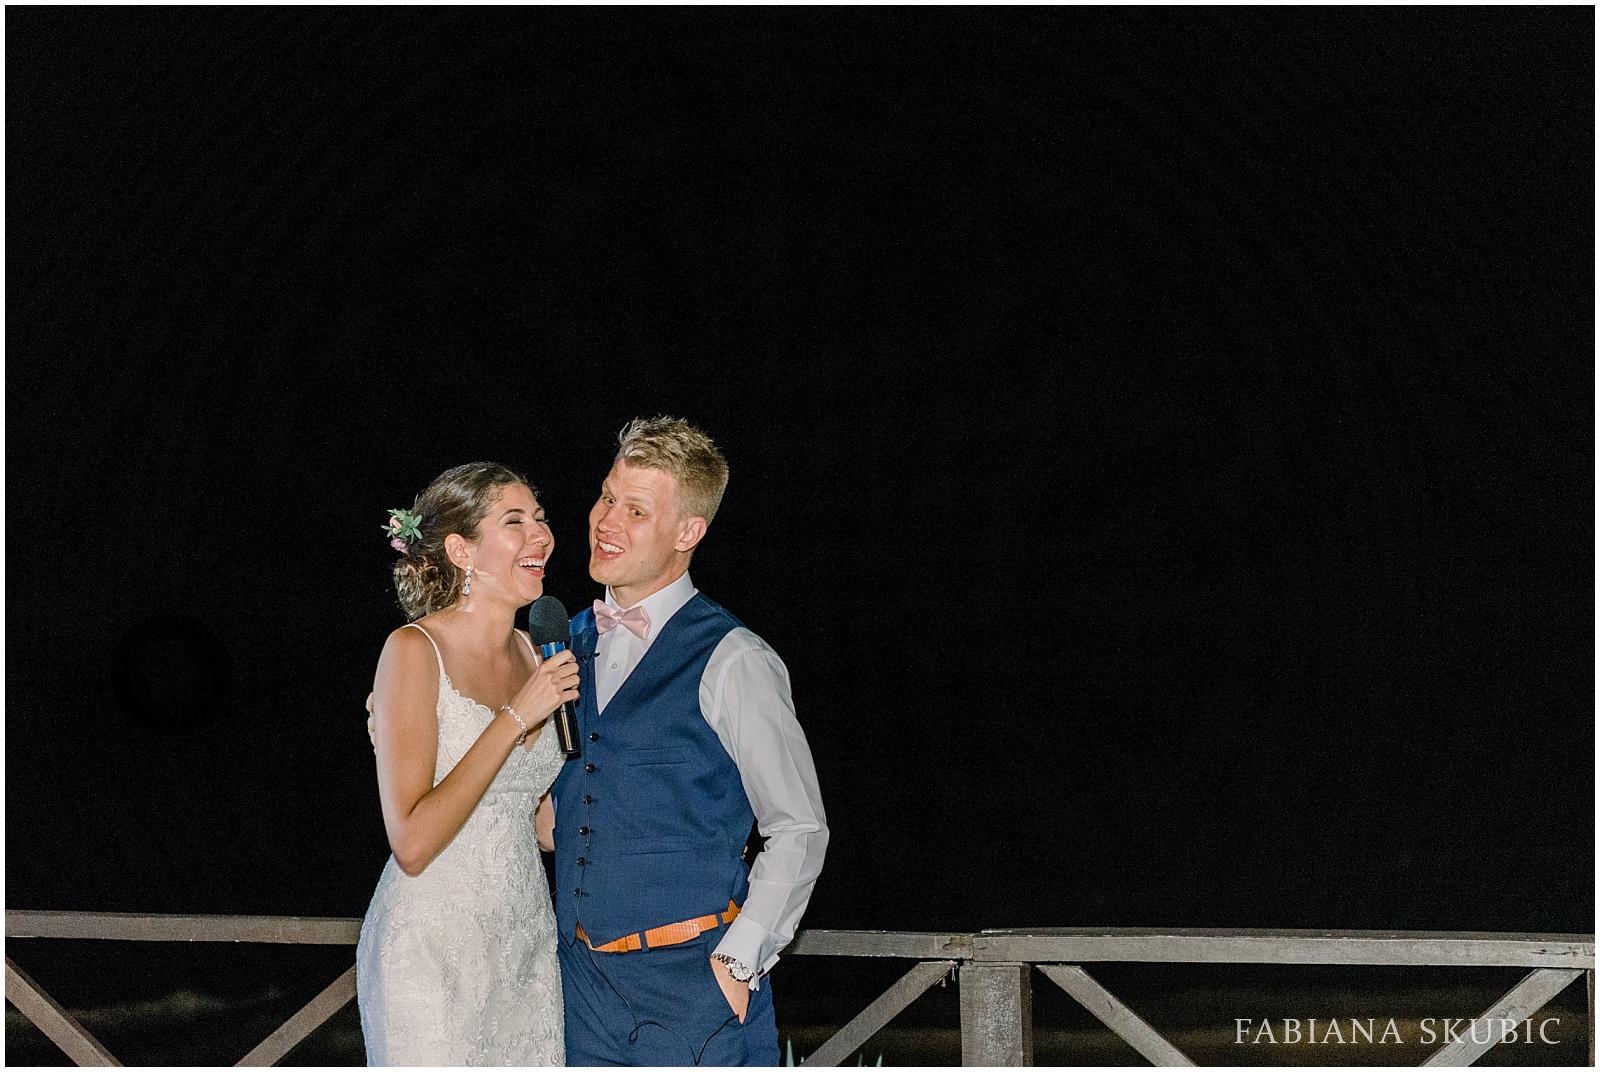 TJ_Now_Sapphire_Riviera_Cancun_Mexico_Wedding_Photos_0282.jpg